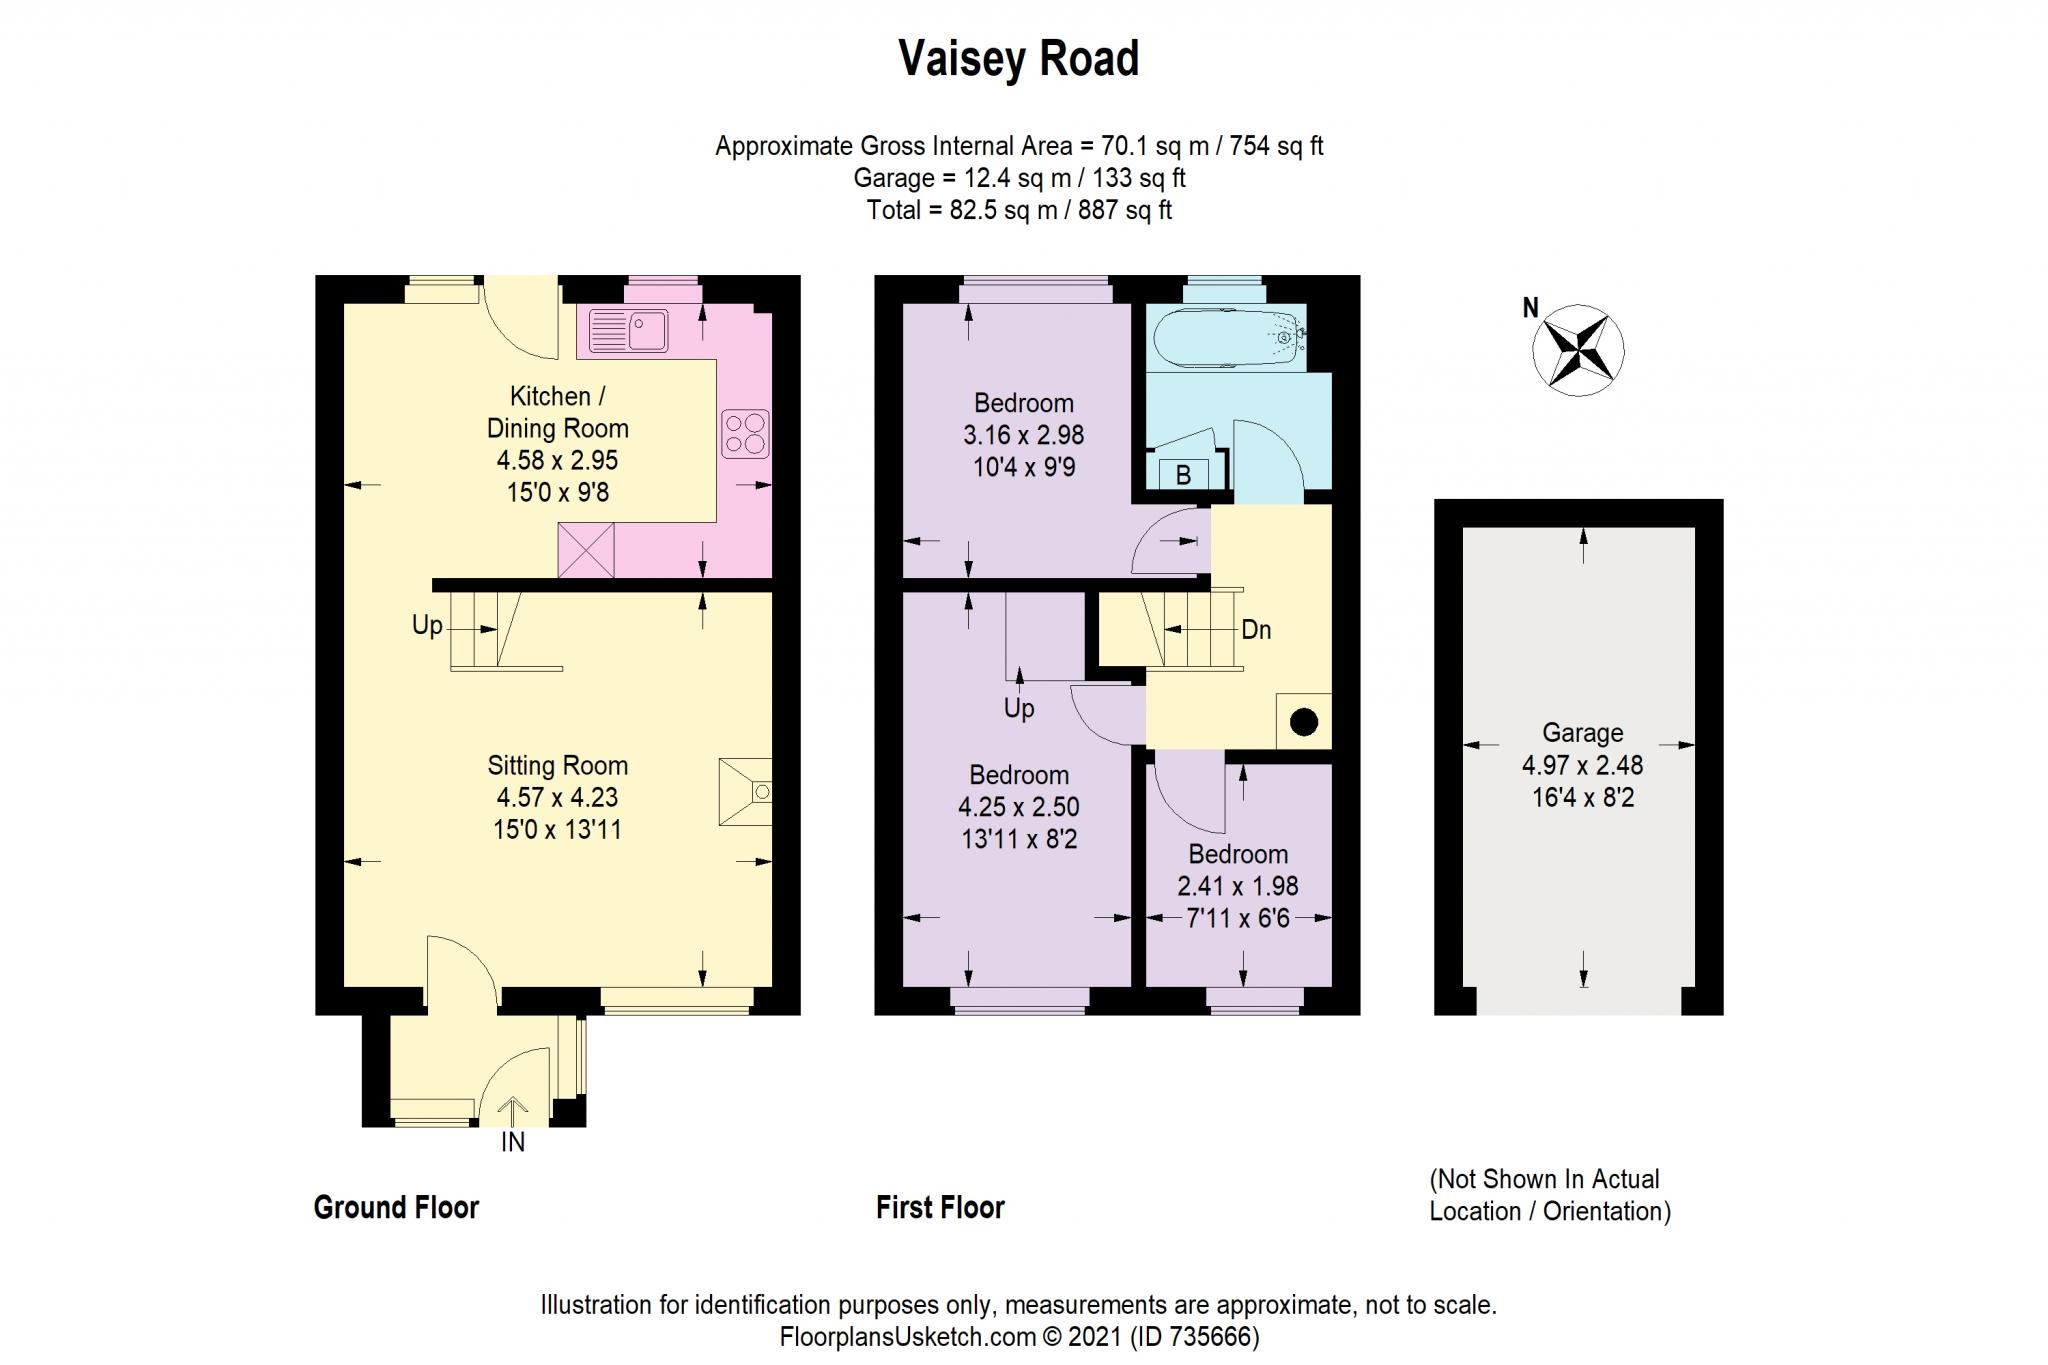 Final_735666_Vaisey-Road-BPC_020321094635176 (1)